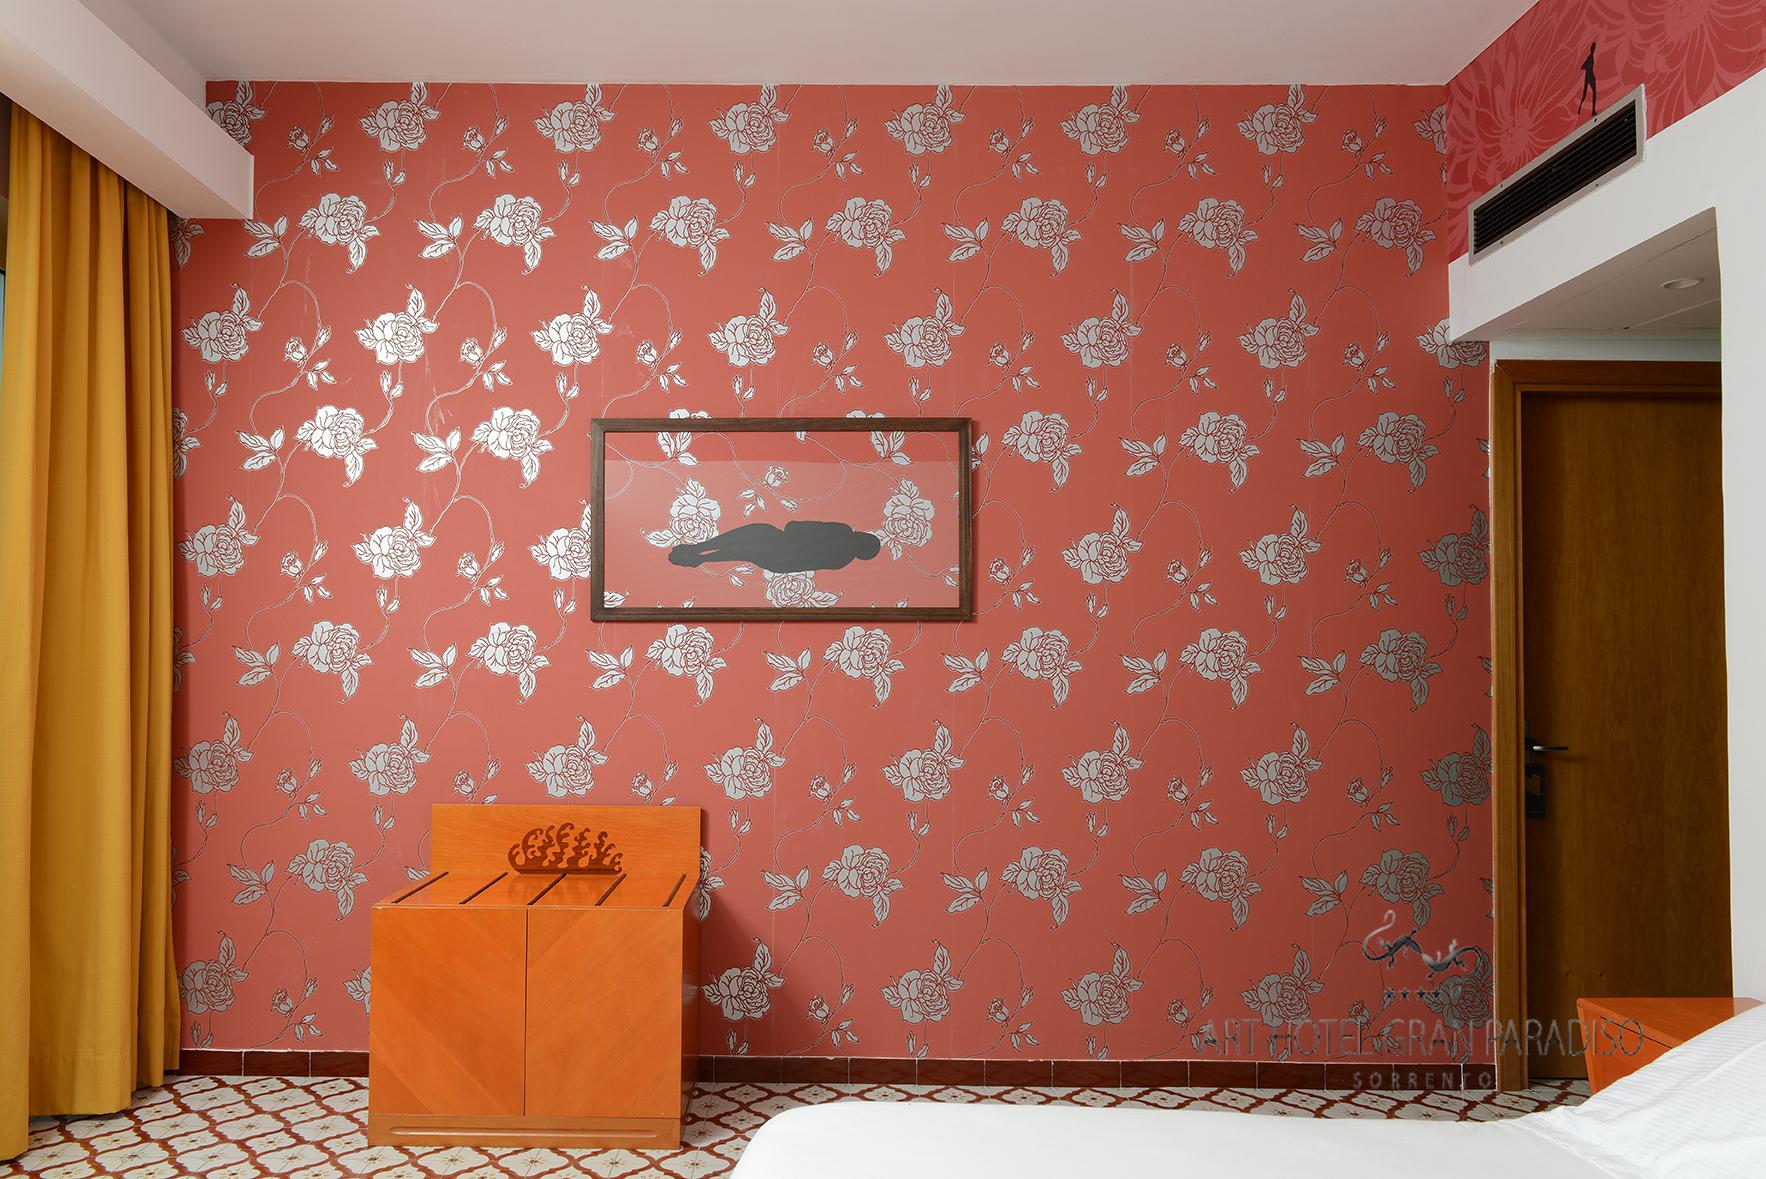 Art_Hotel_Gran_Paradiso_2013_311_Donatella_Spaziani_1.jpg